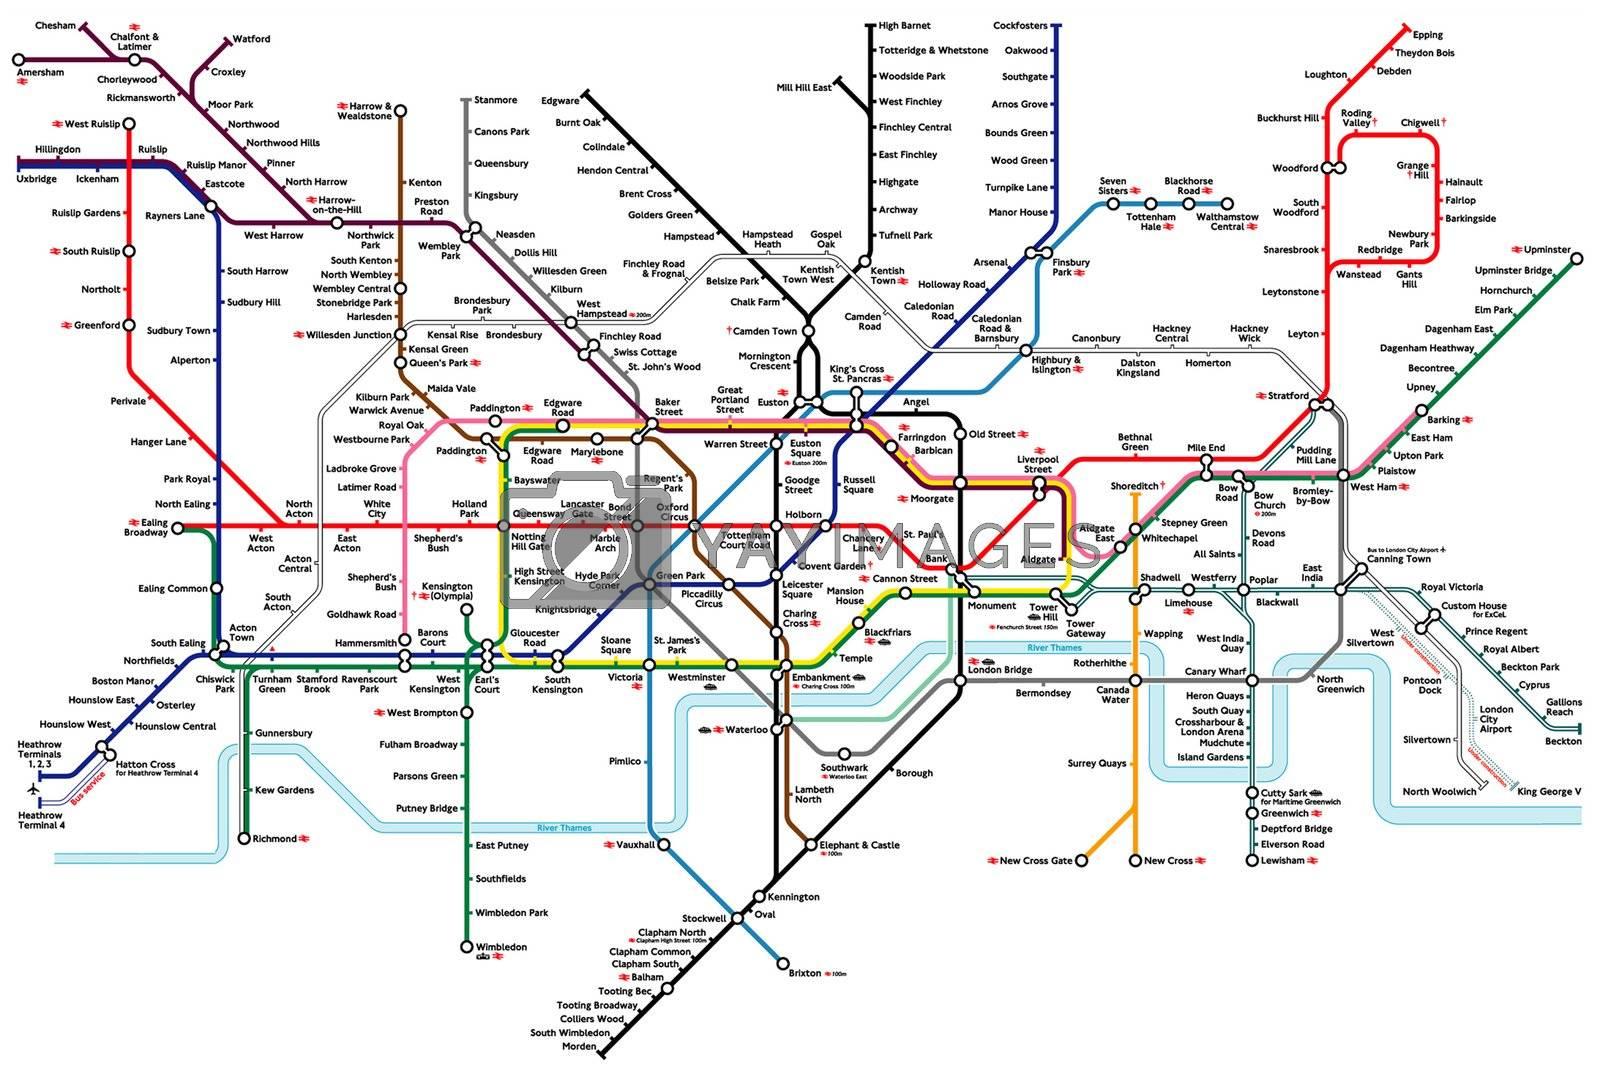 London Underground Tube map by speedfighter